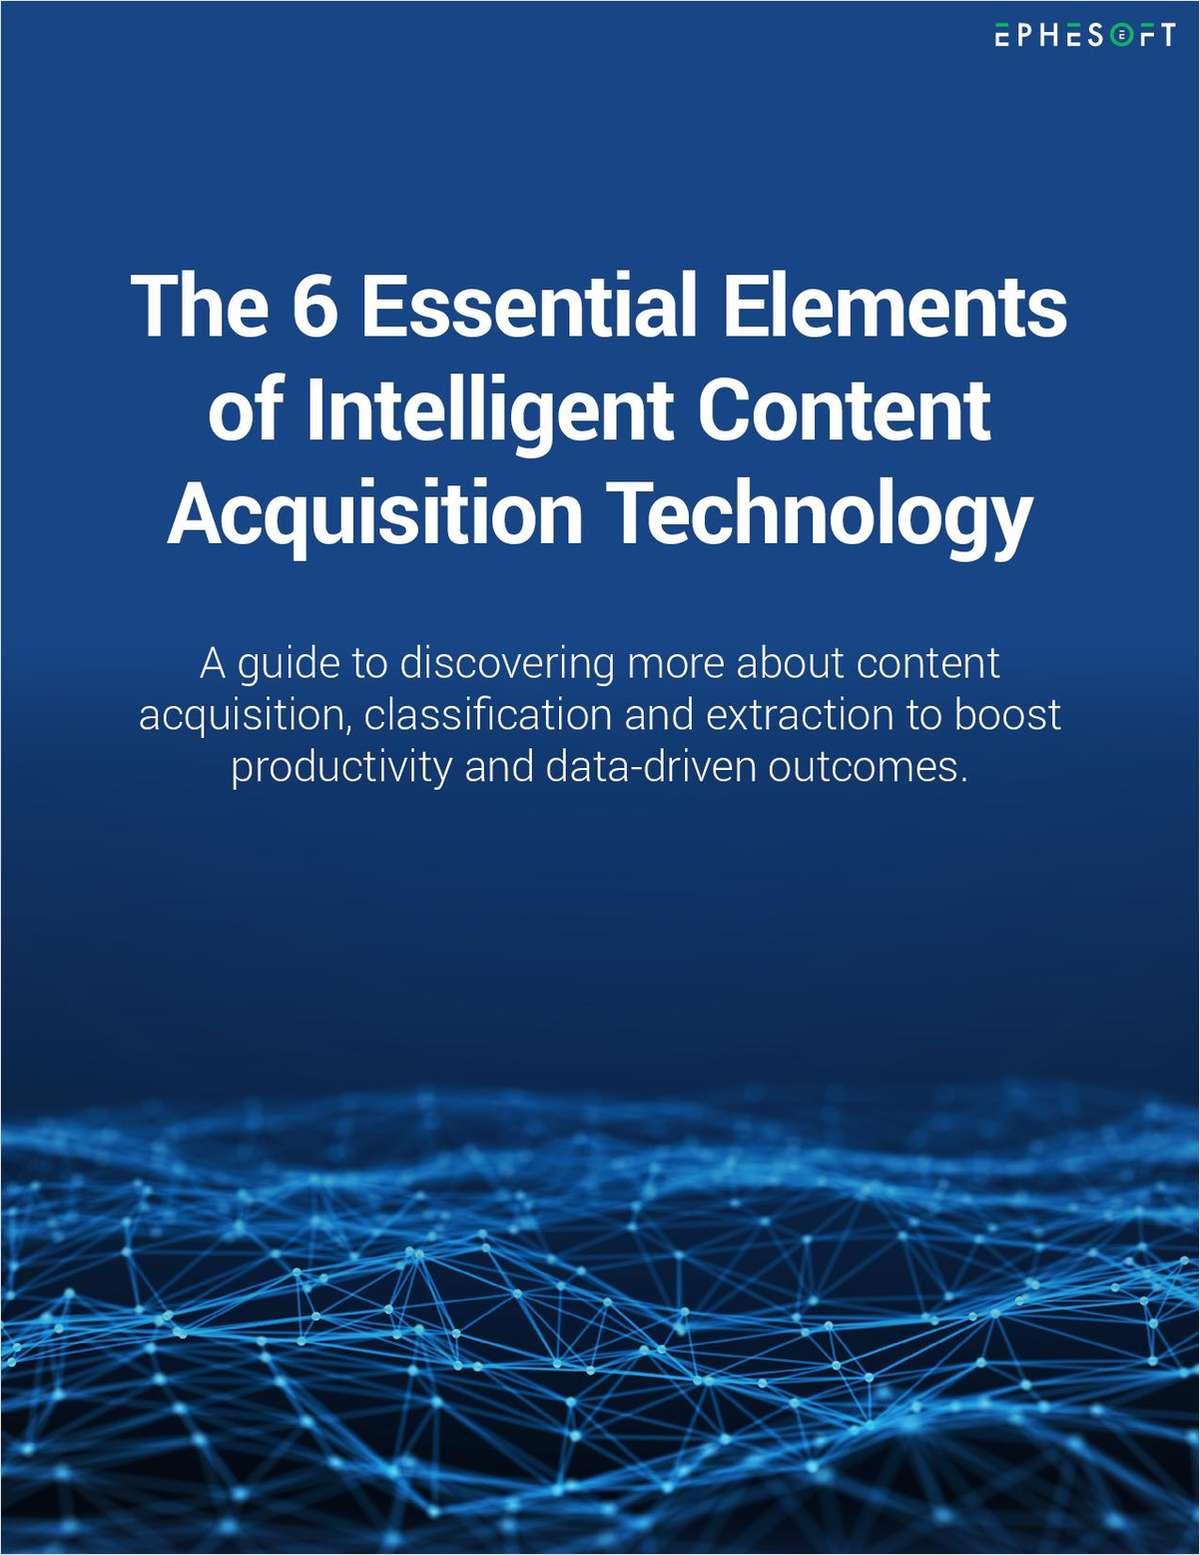 Six Elements of Content Acquisition Technology